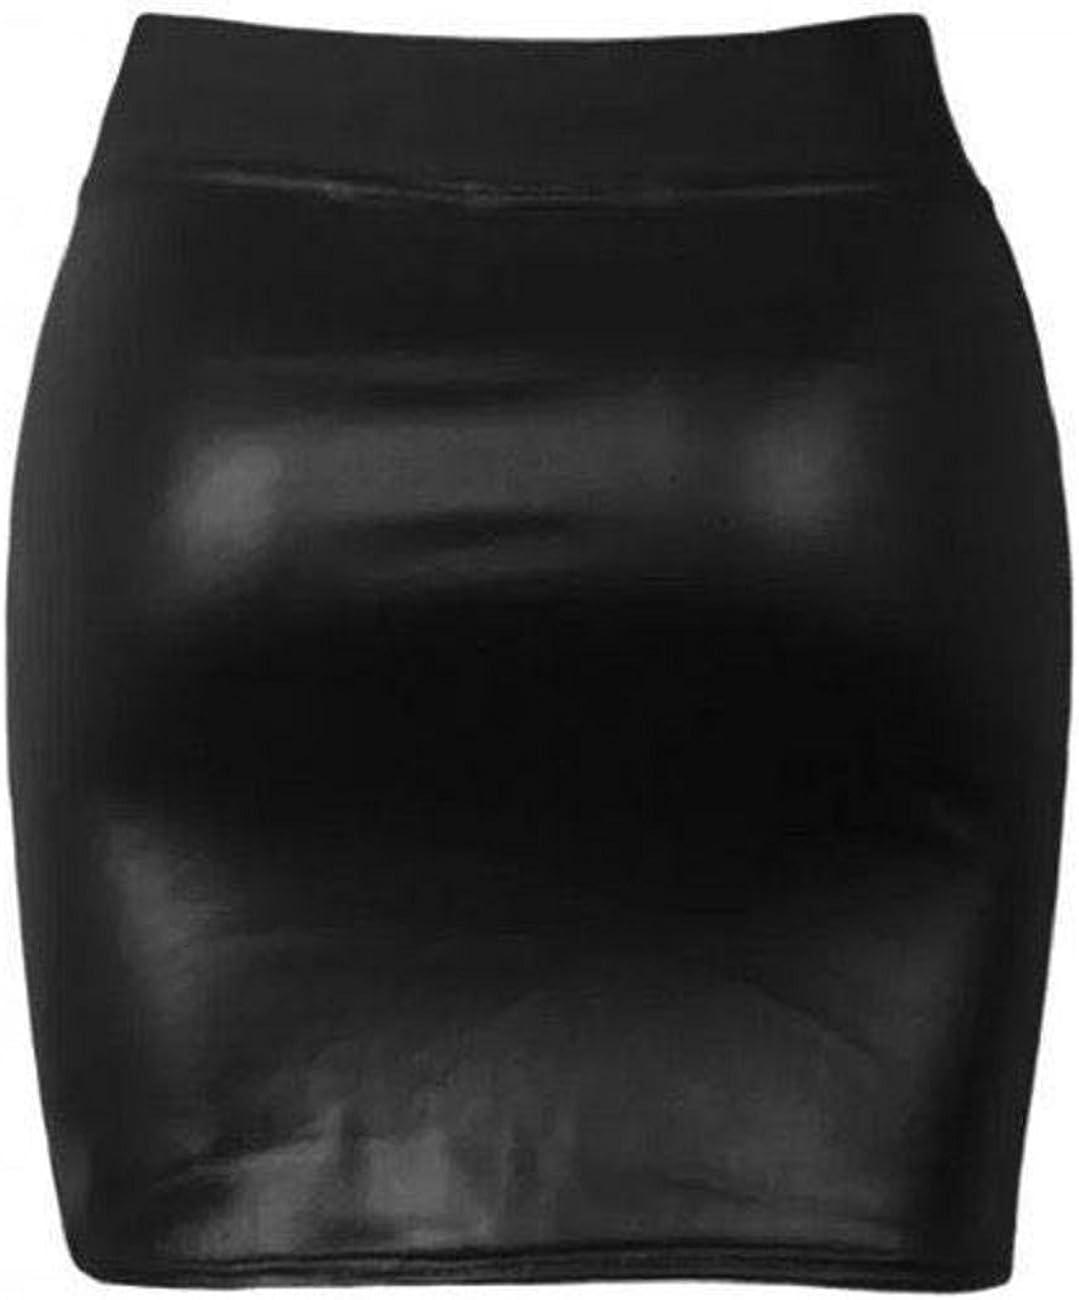 FH STREET Black Wet Look Shinny Faux Leather Short PVC Mini Skirt-Size-New